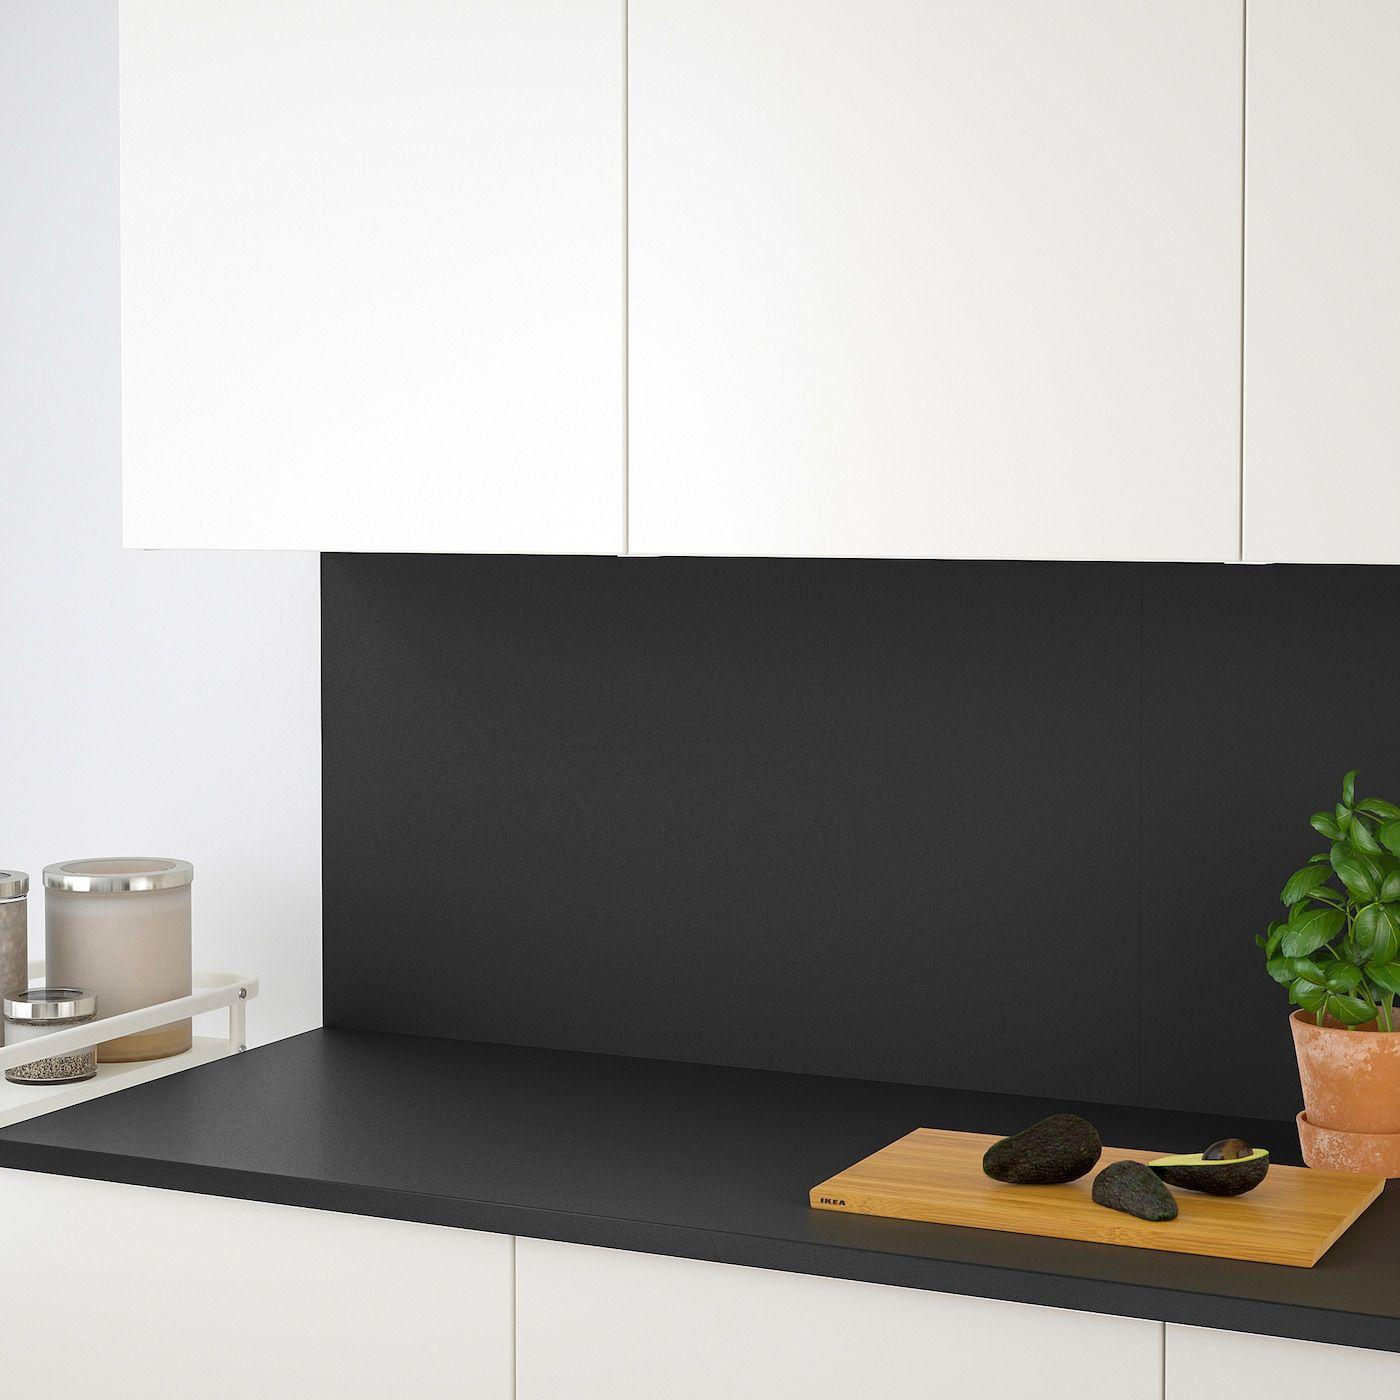 Ekbacken Arbeitsplatte Mattiert Anthrazit Laminat Ikea Osterreich In 2020 Laminate Countertops Countertops Ikea